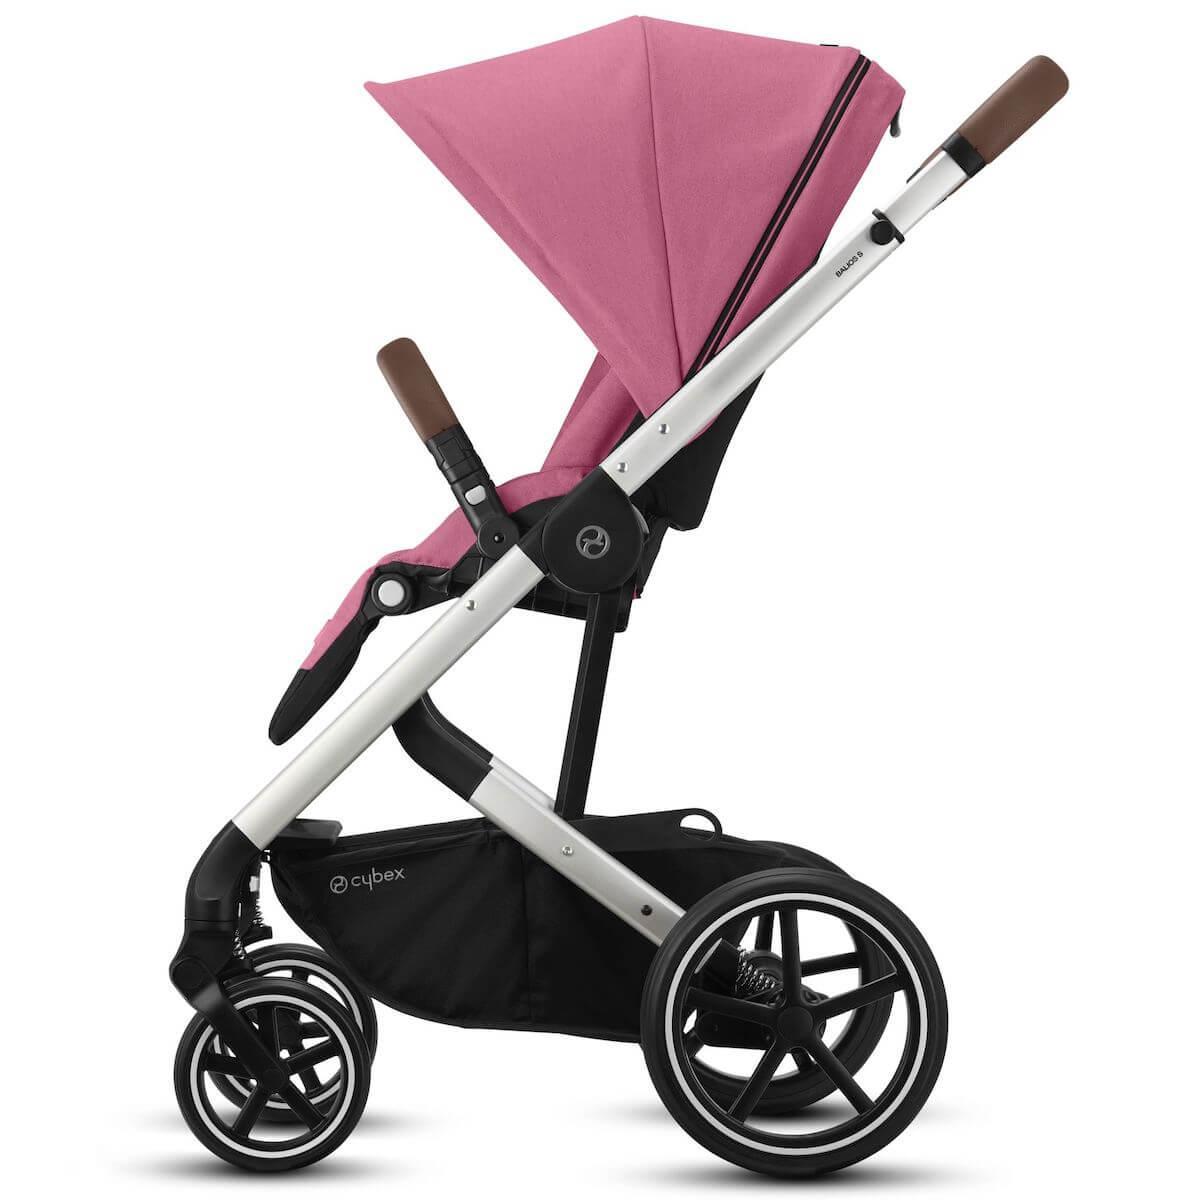 Kinderwagen BALIOS S LUX SLV Cybex Magnolia Pink